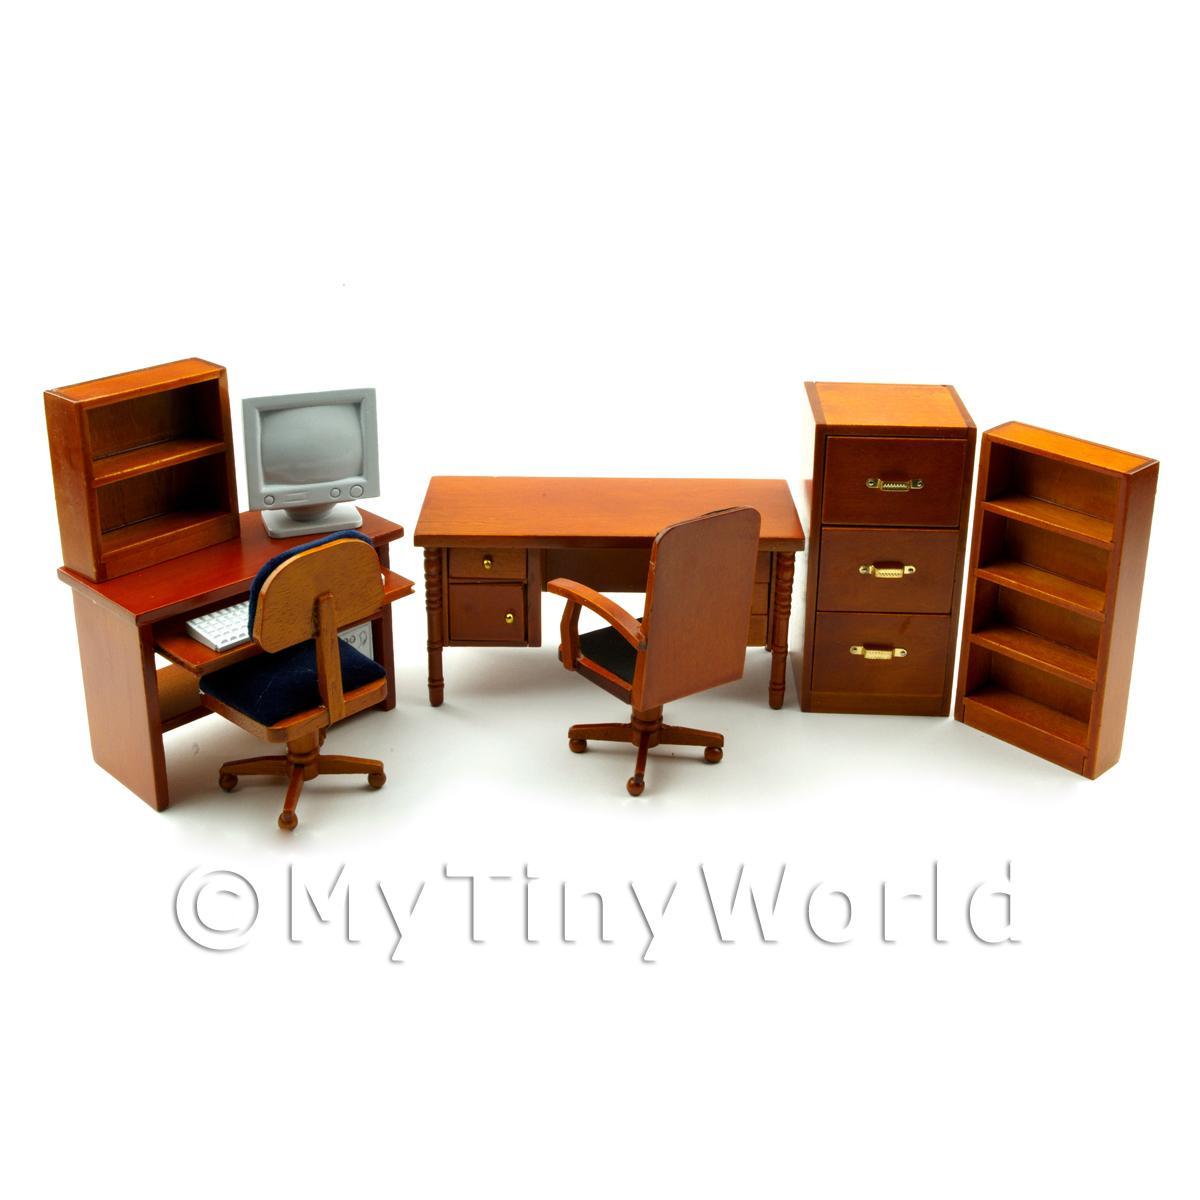 furniture sets dolls house miniature mytinyworld